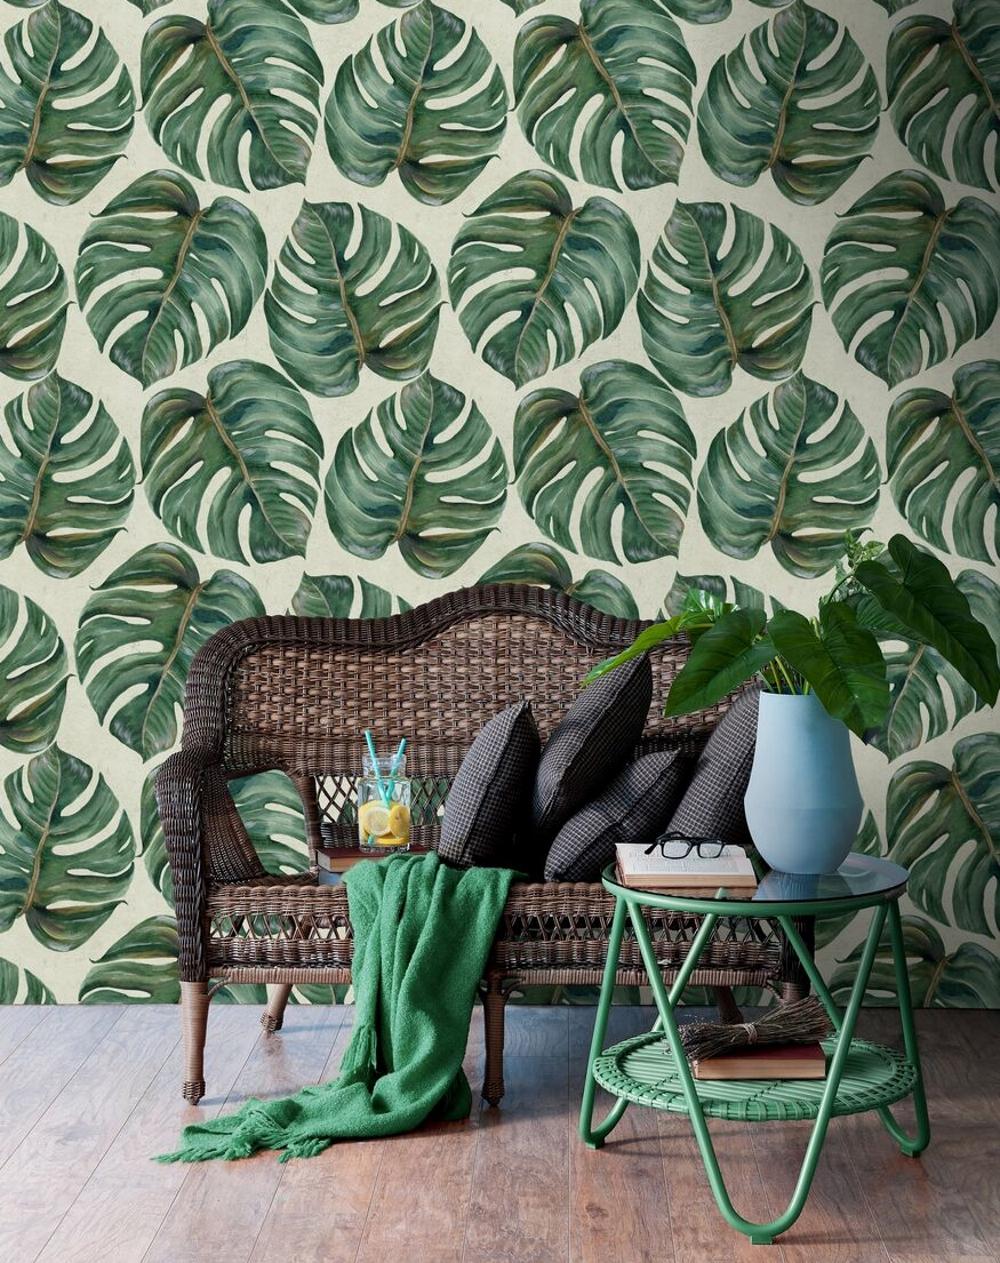 Tropical Leaf Wallpaper| Mind The Gap